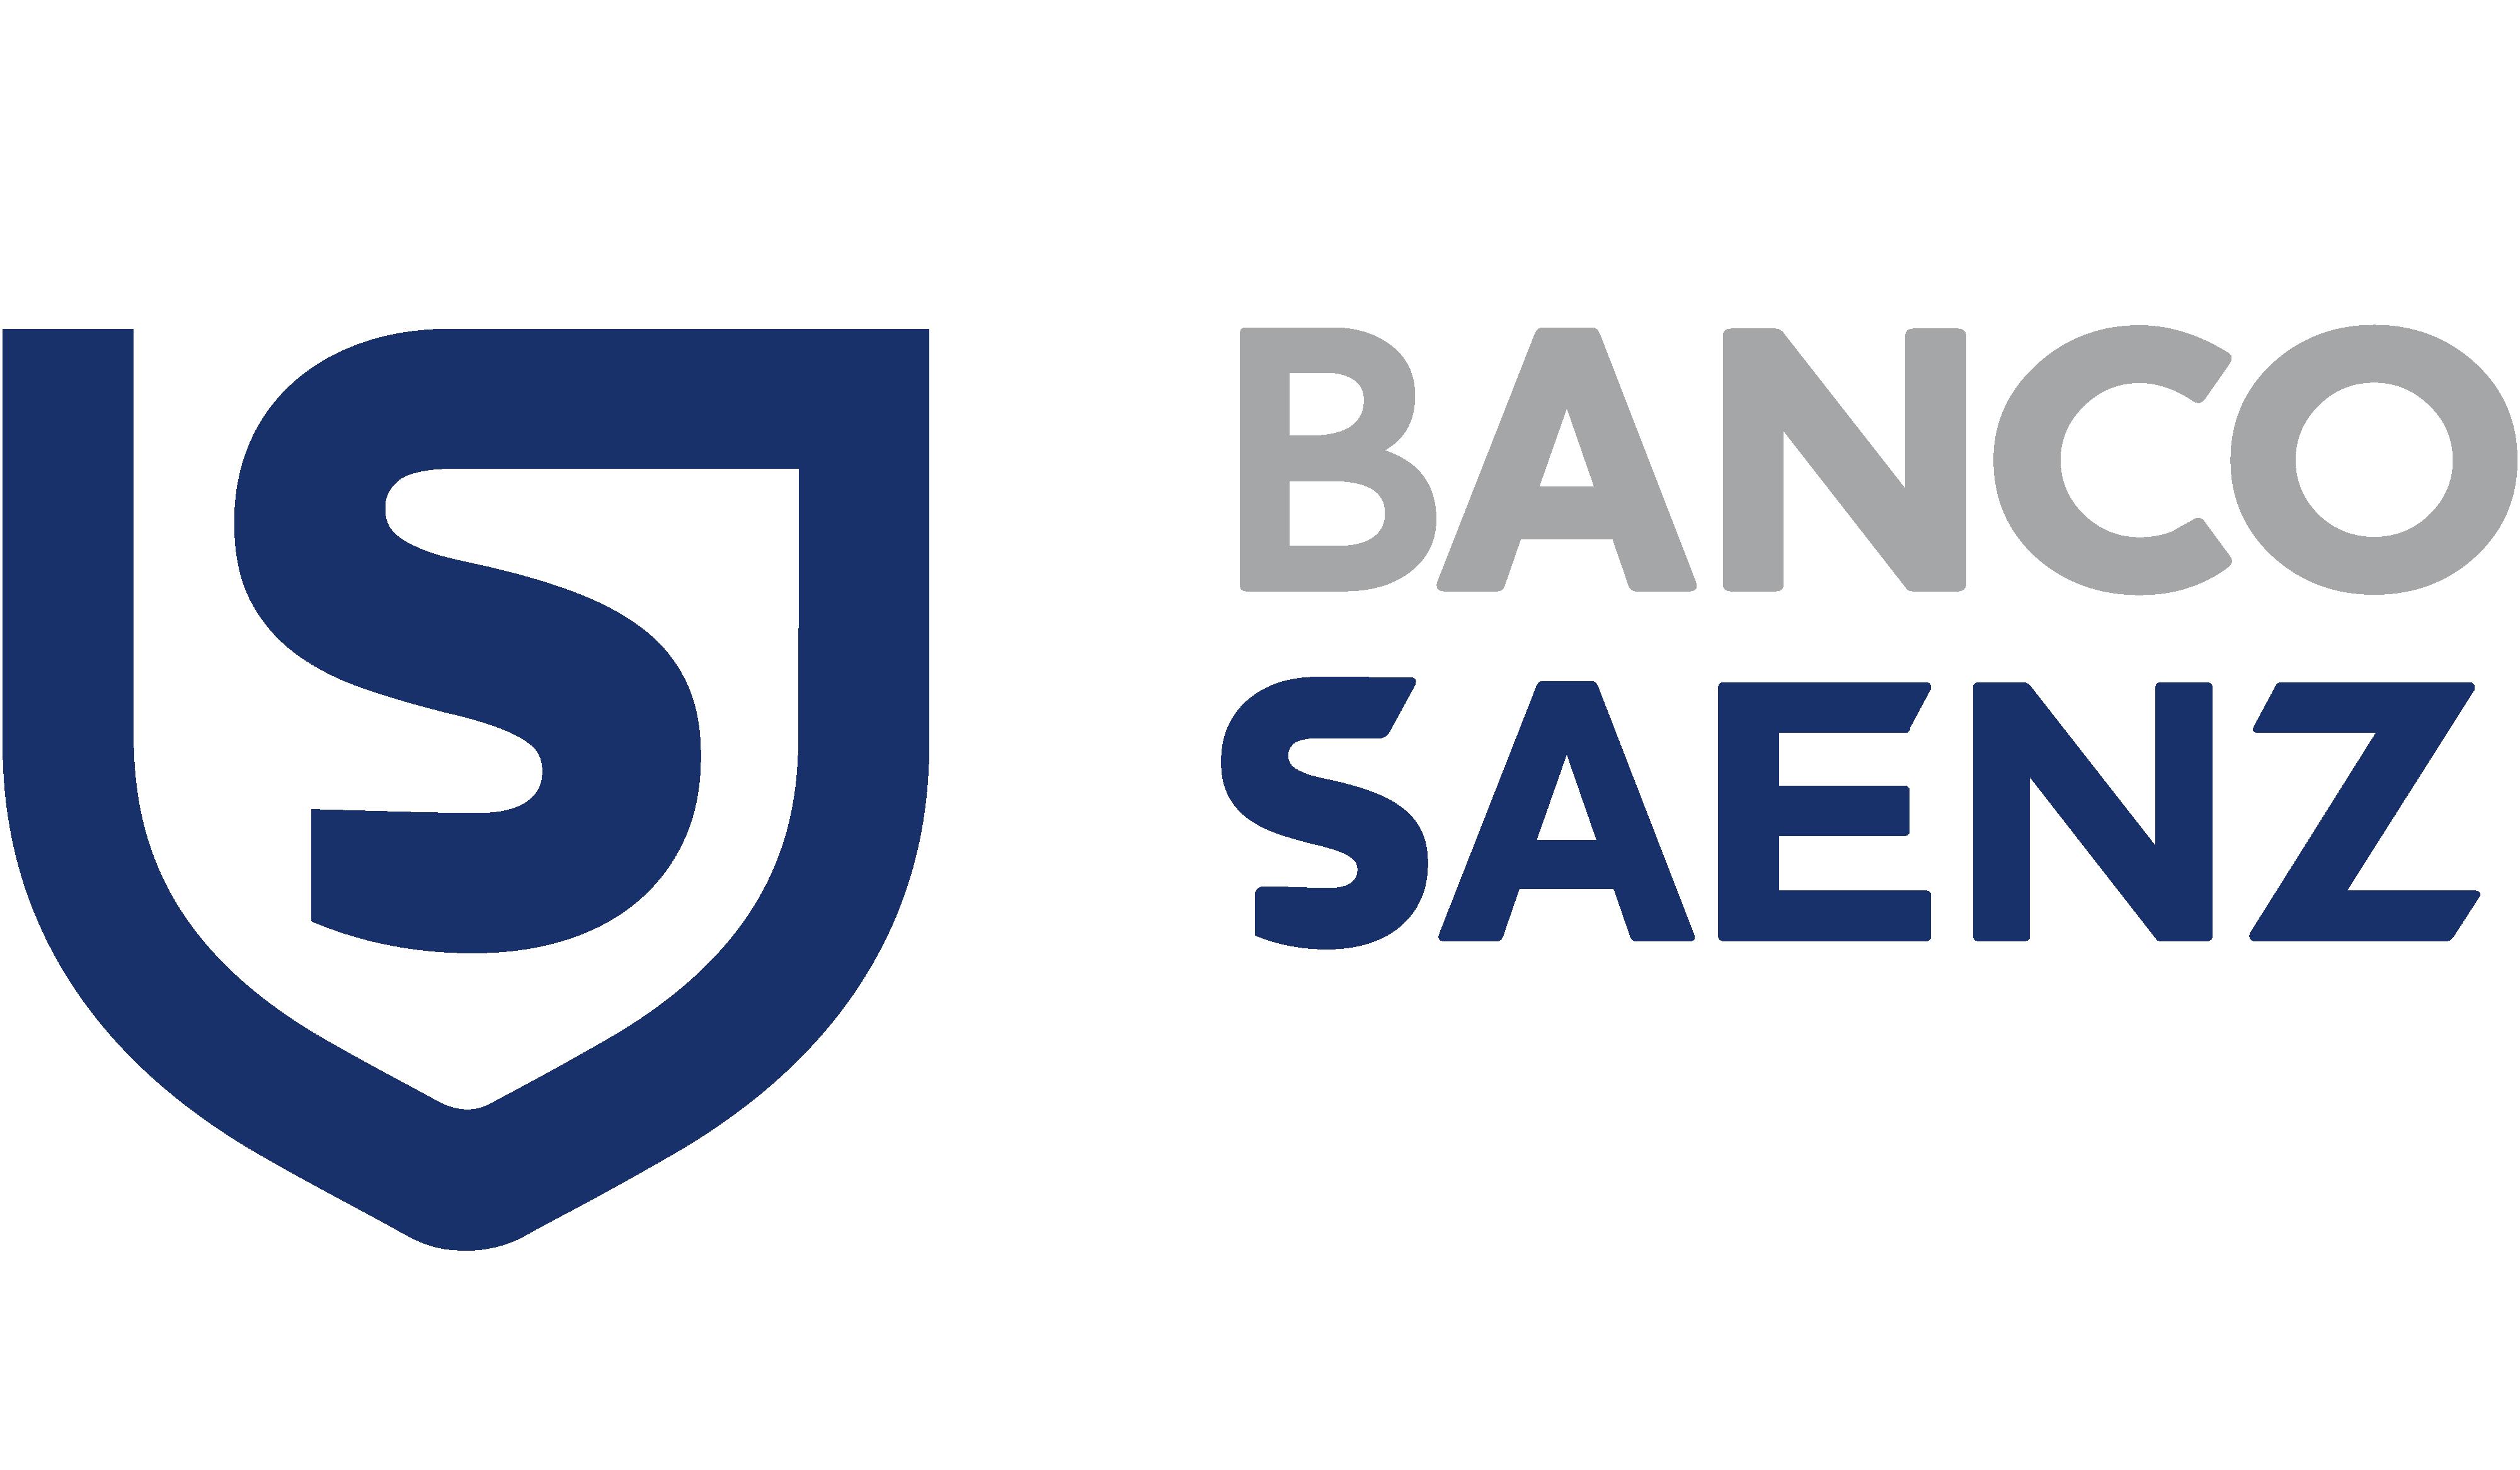 Banco Saenz